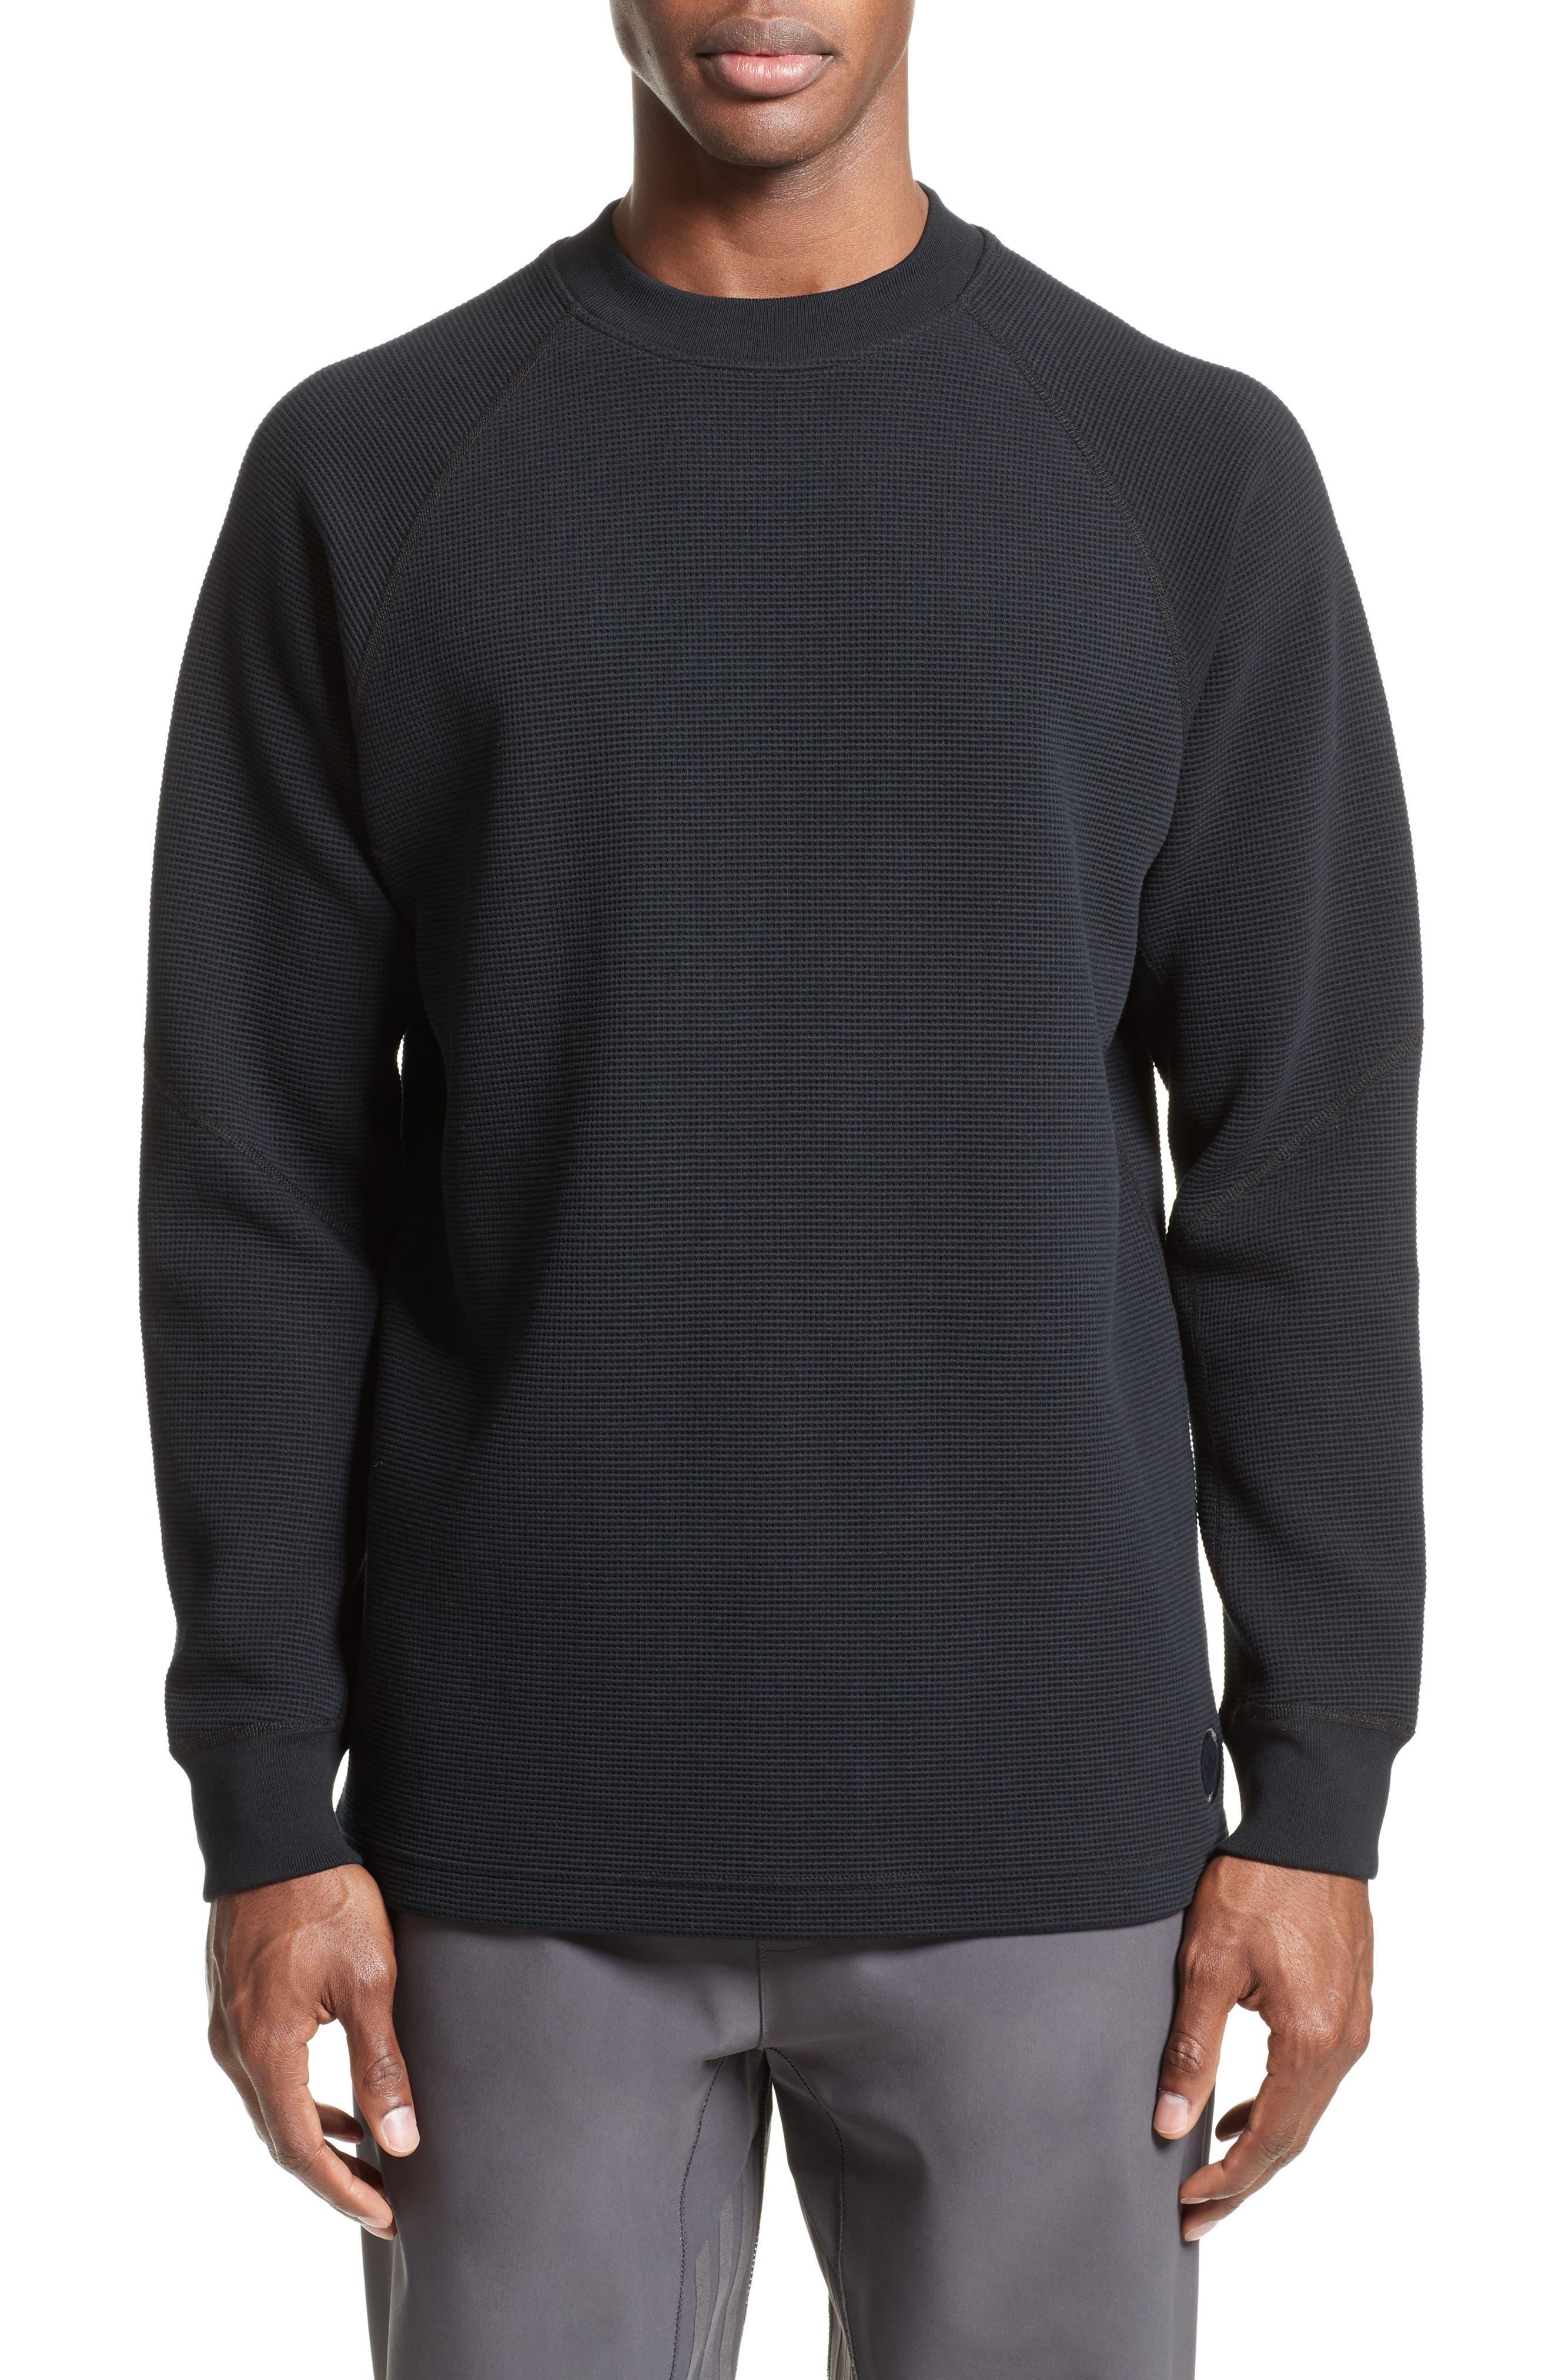 Fisherman Crewneck Sweatshirt,                             Main thumbnail 1, color,                             Black